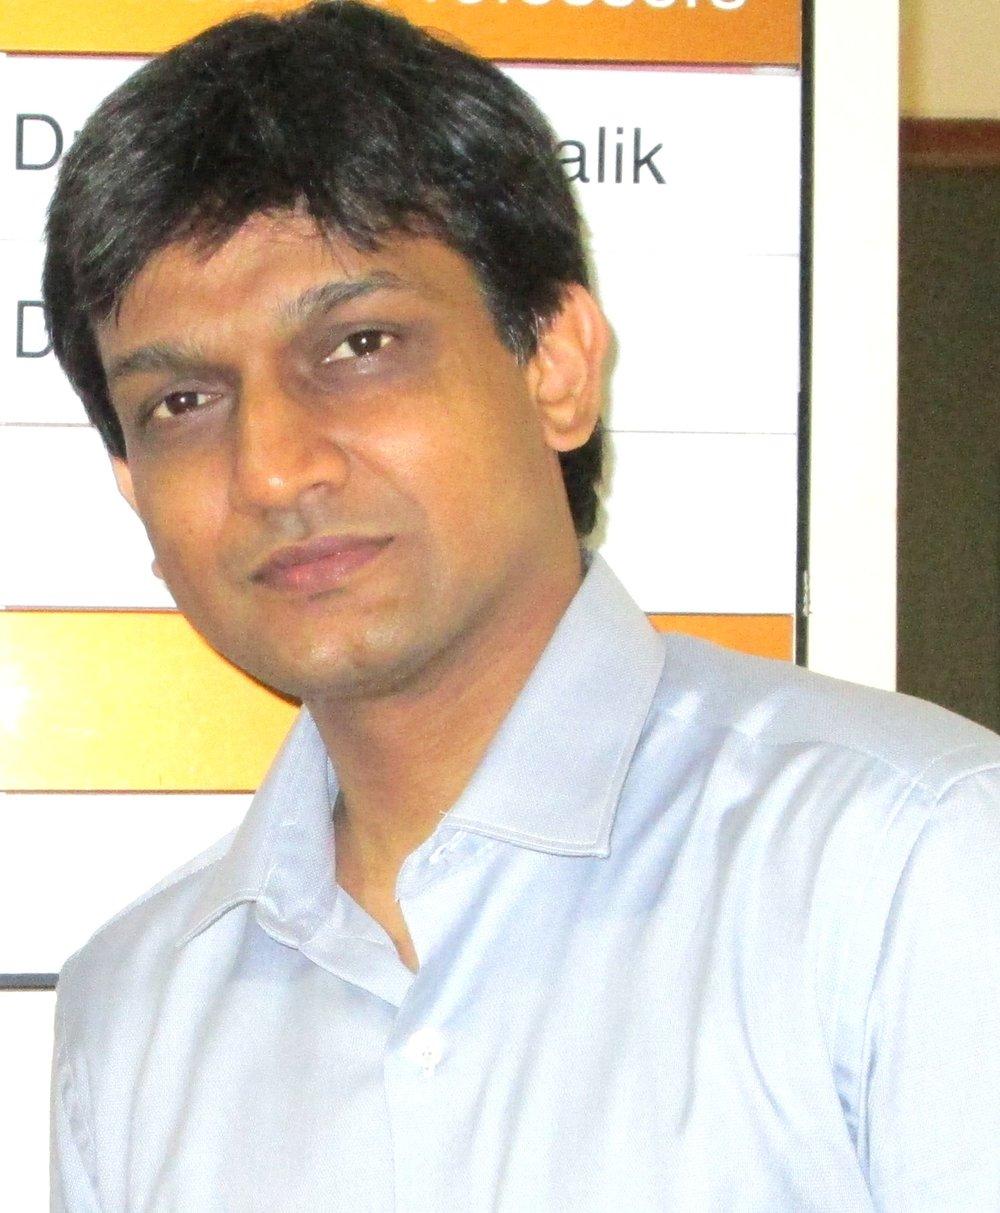 Dr.Raghu Radhakrishnan - Professor and Head of Oral Pathology, CODS, Manipal.